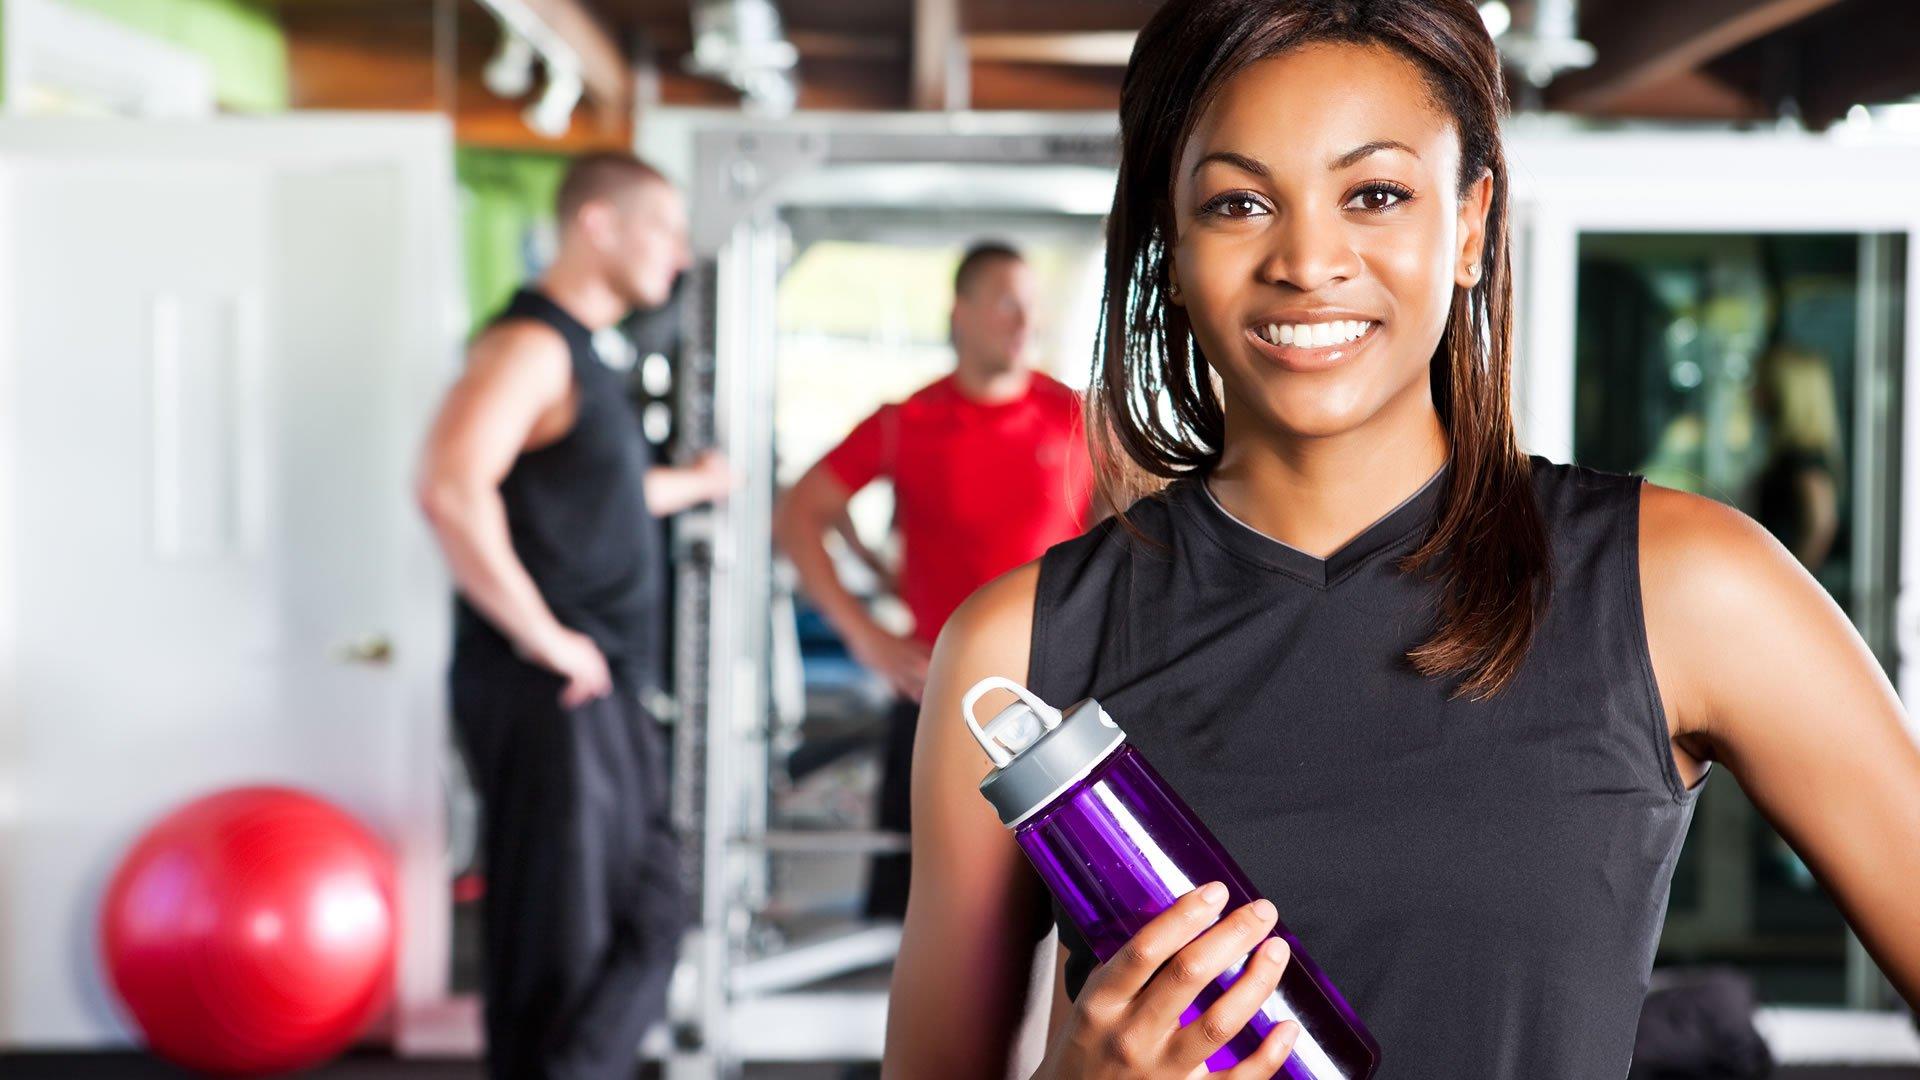 Atlanta Fitness is now Onelife Fitness